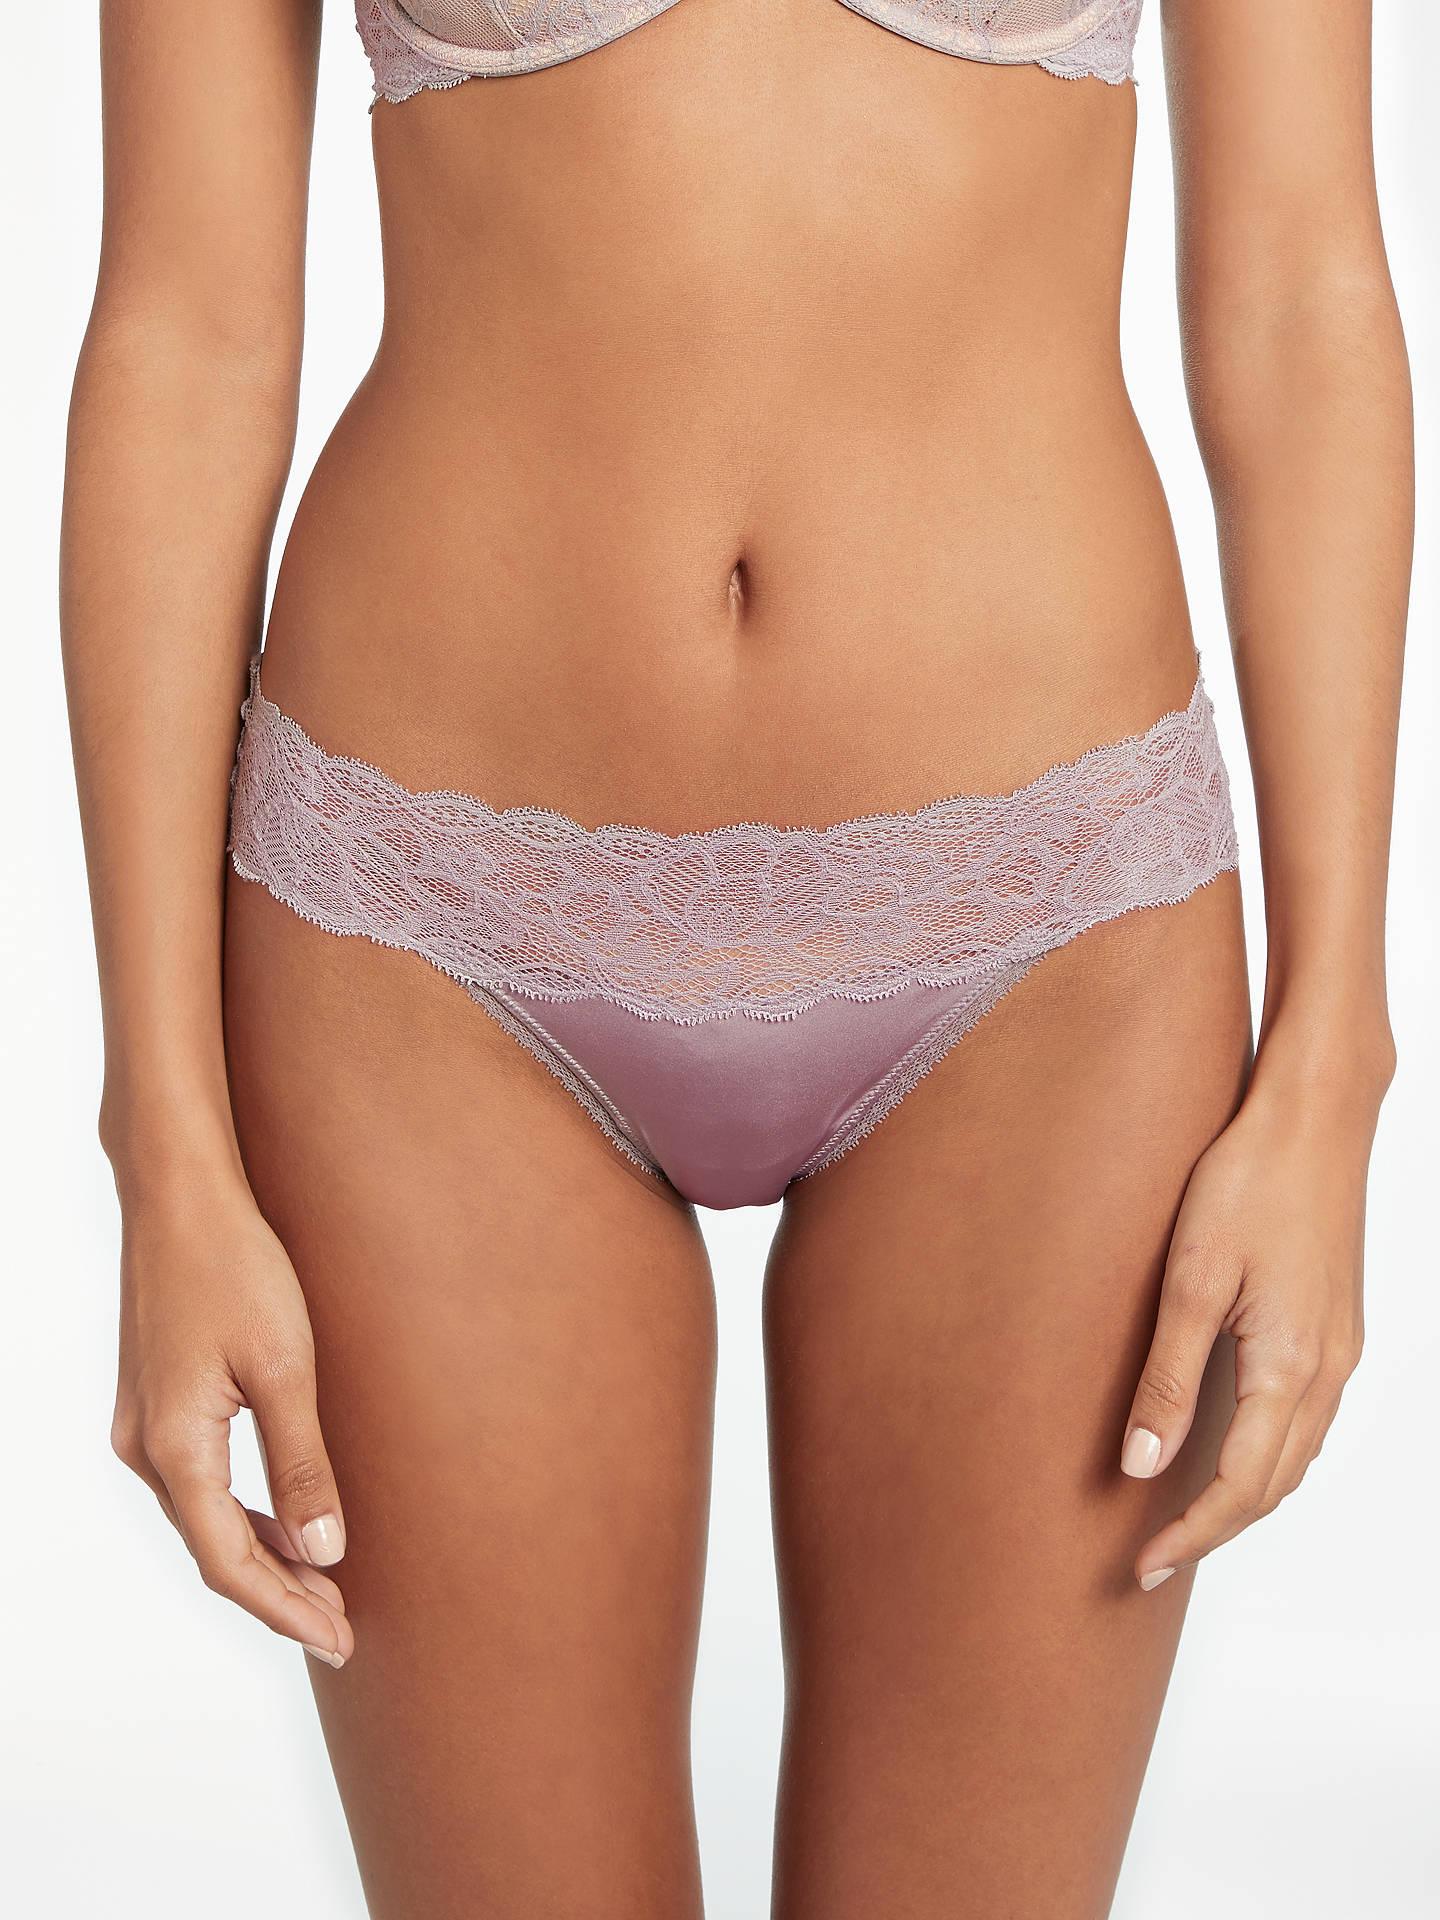 009e4034eb54 Buy Calvin Klein Underwear Seductive Comfort Lace Bikini Briefs, Violet  Dust, S Online at ...